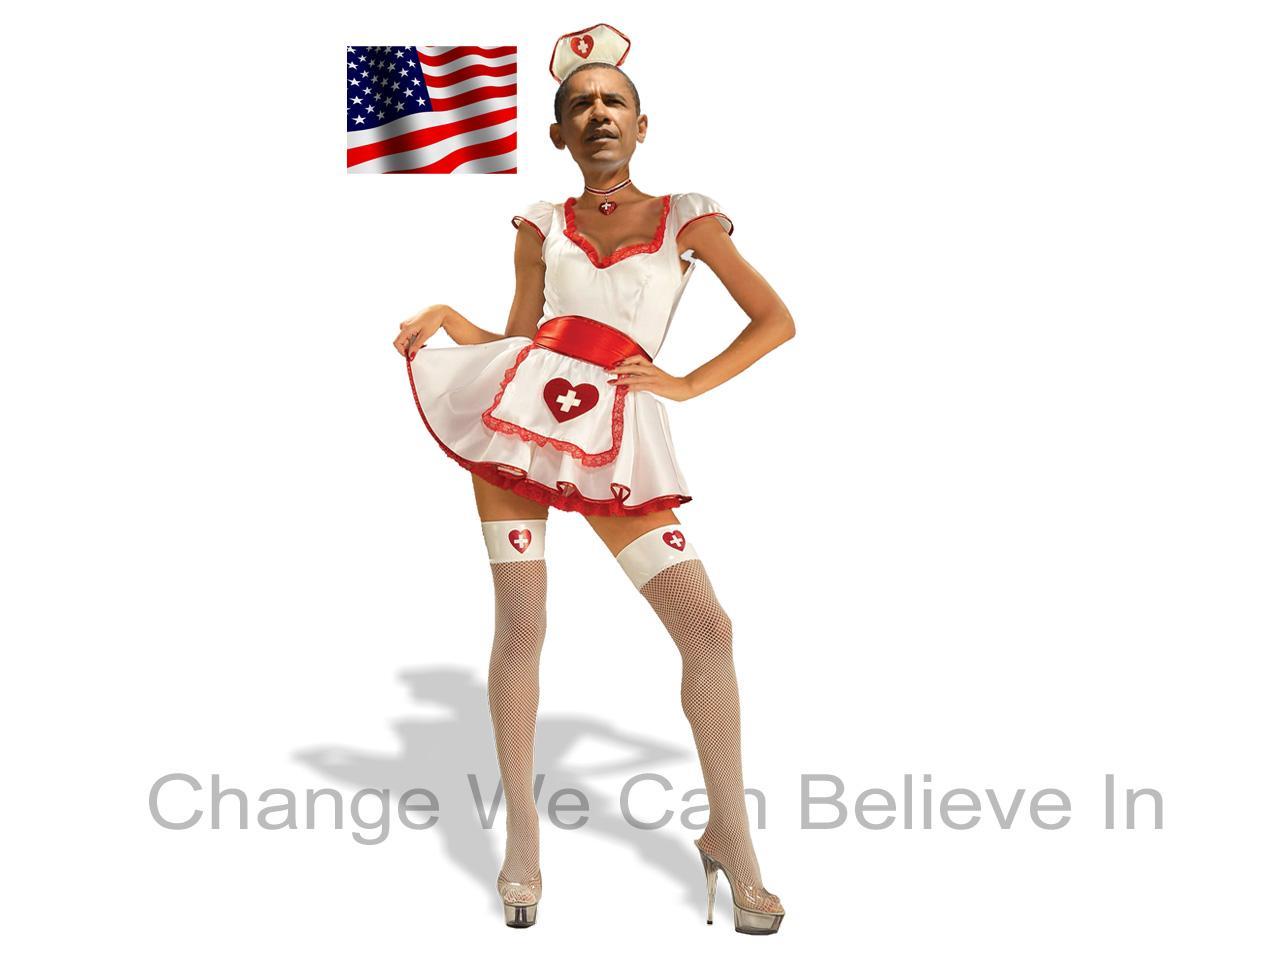 Desktop wallpapers Barak Obama hope action change funny picture 1280x960